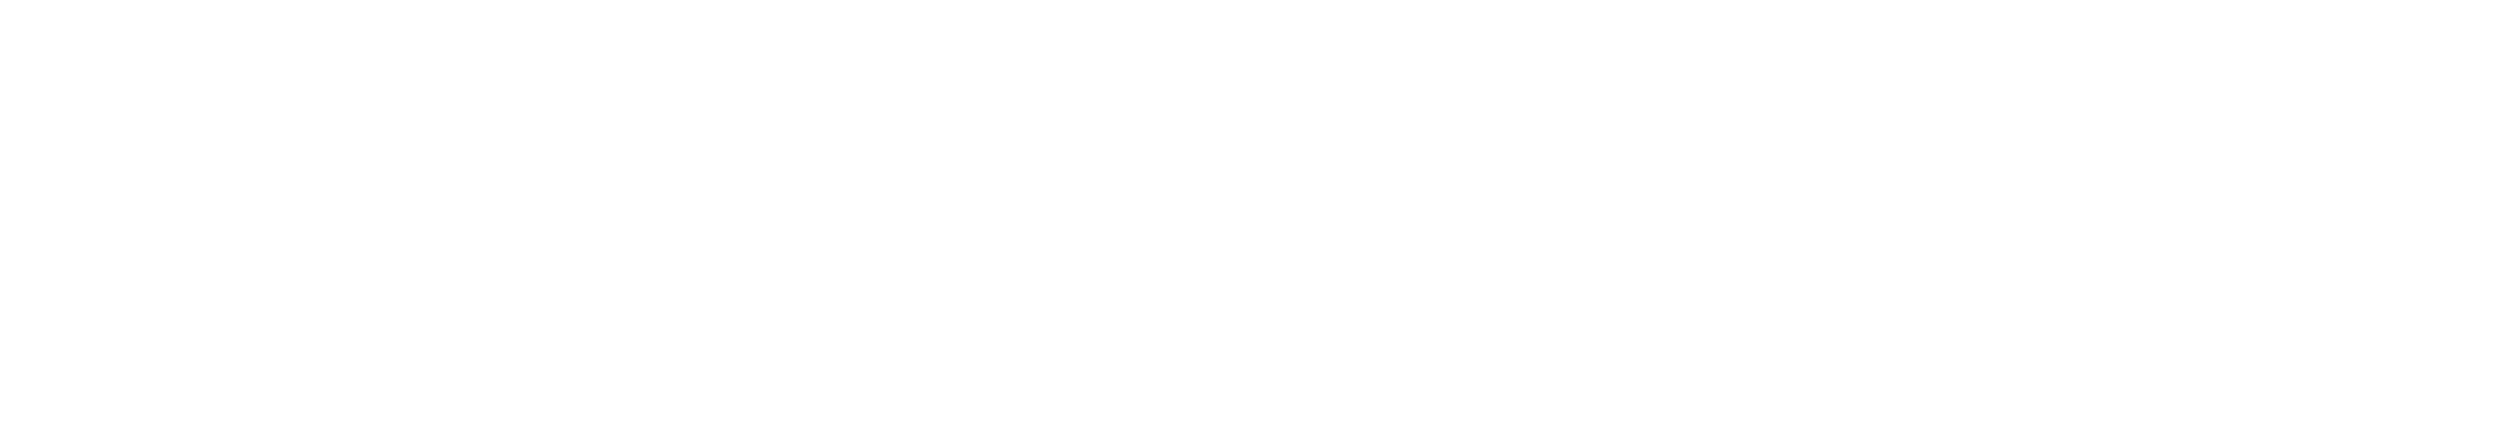 Refine The Retreat logo_white.png